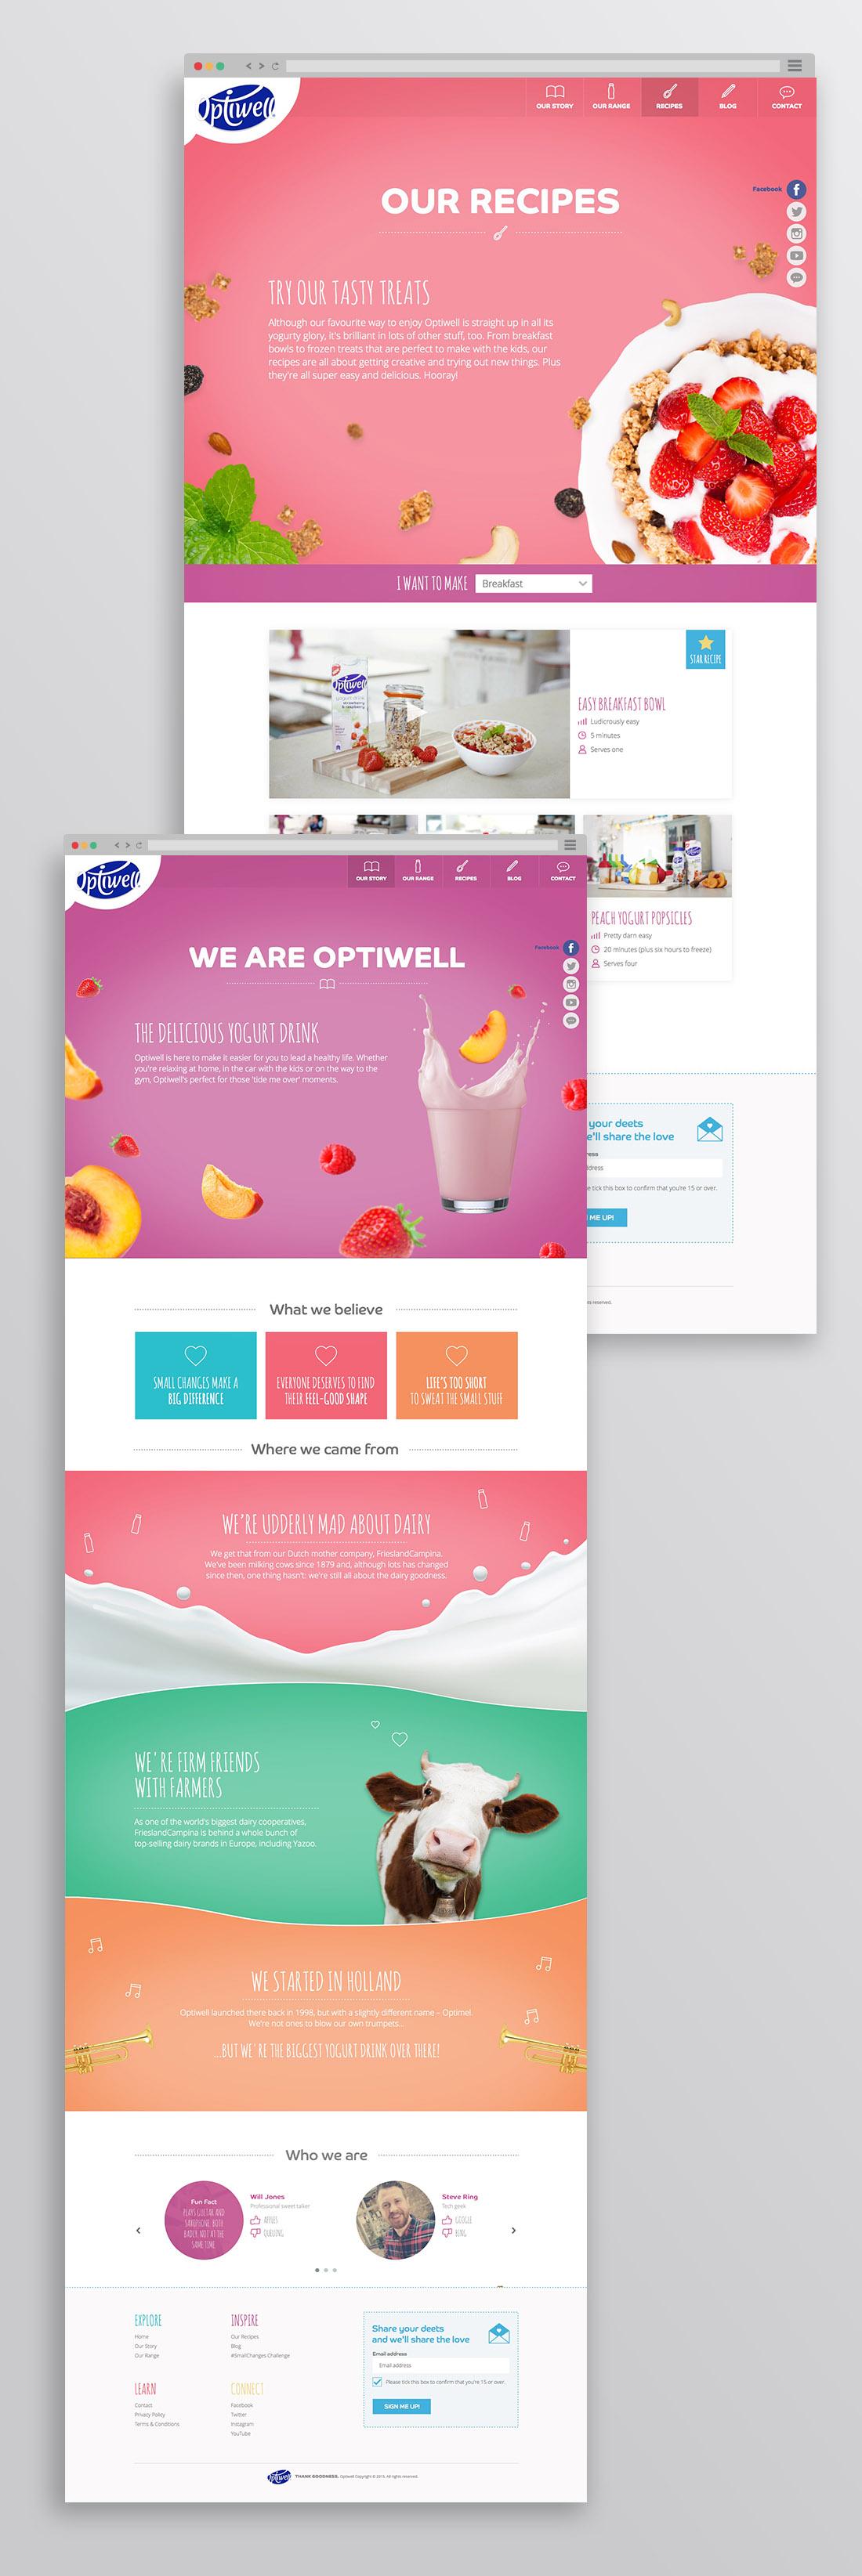 TinyBeastDesign-Optiwell-Website